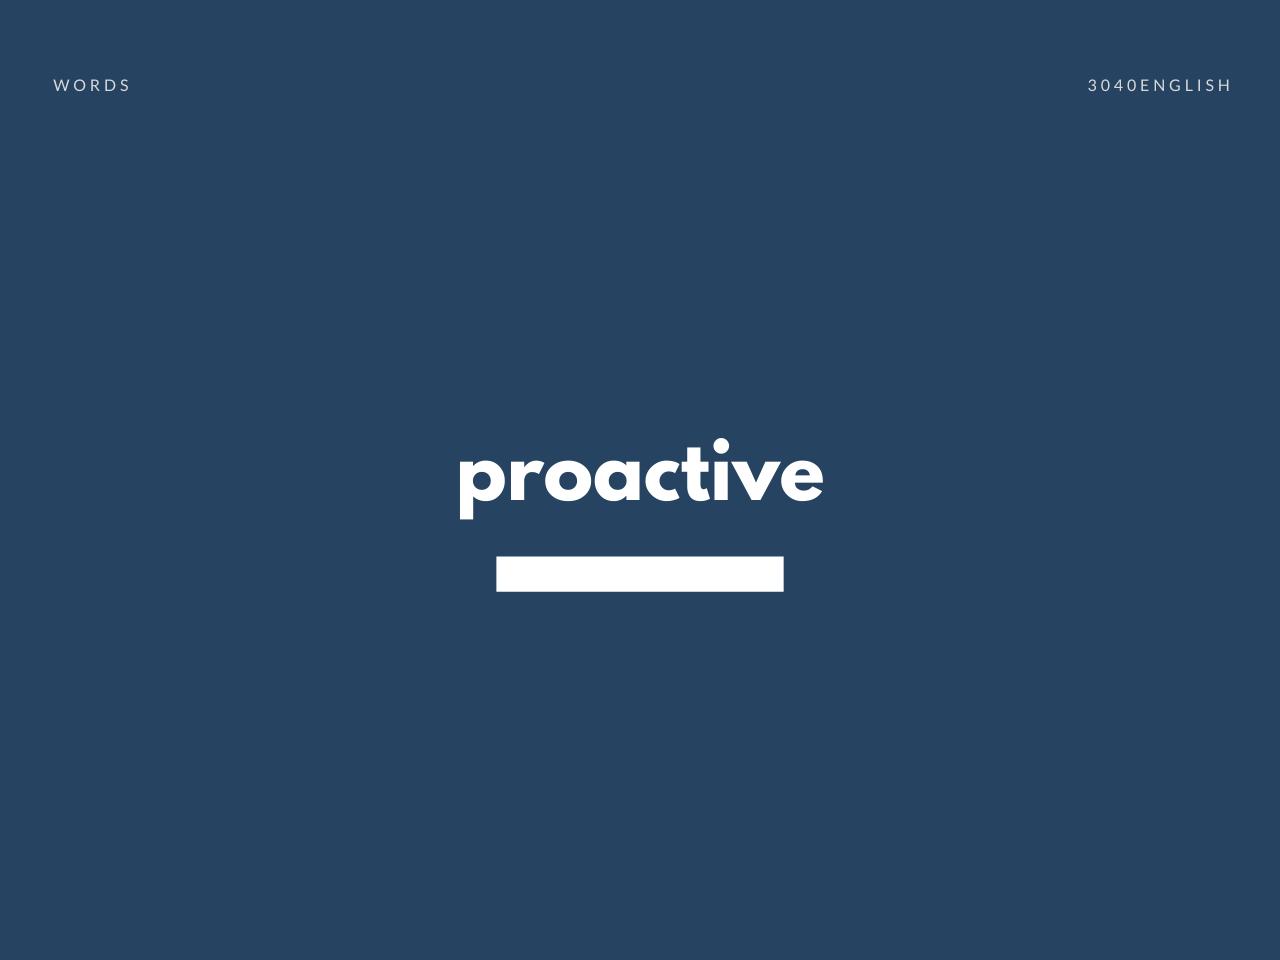 proactive の意味と簡単な使い方【音読用例文あり】